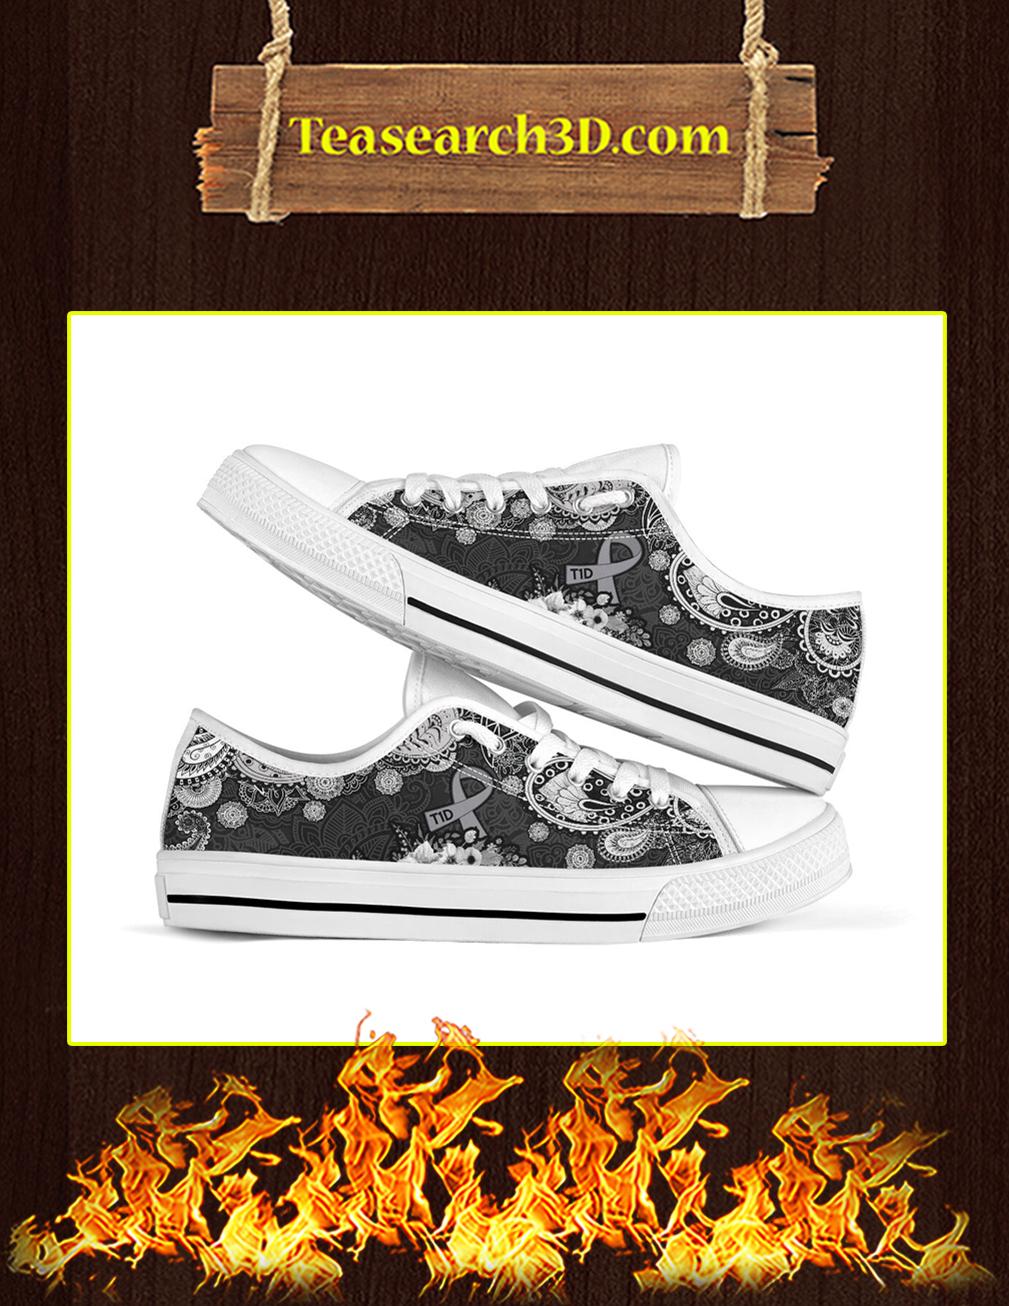 T1D Low Top Shoes Pic 1